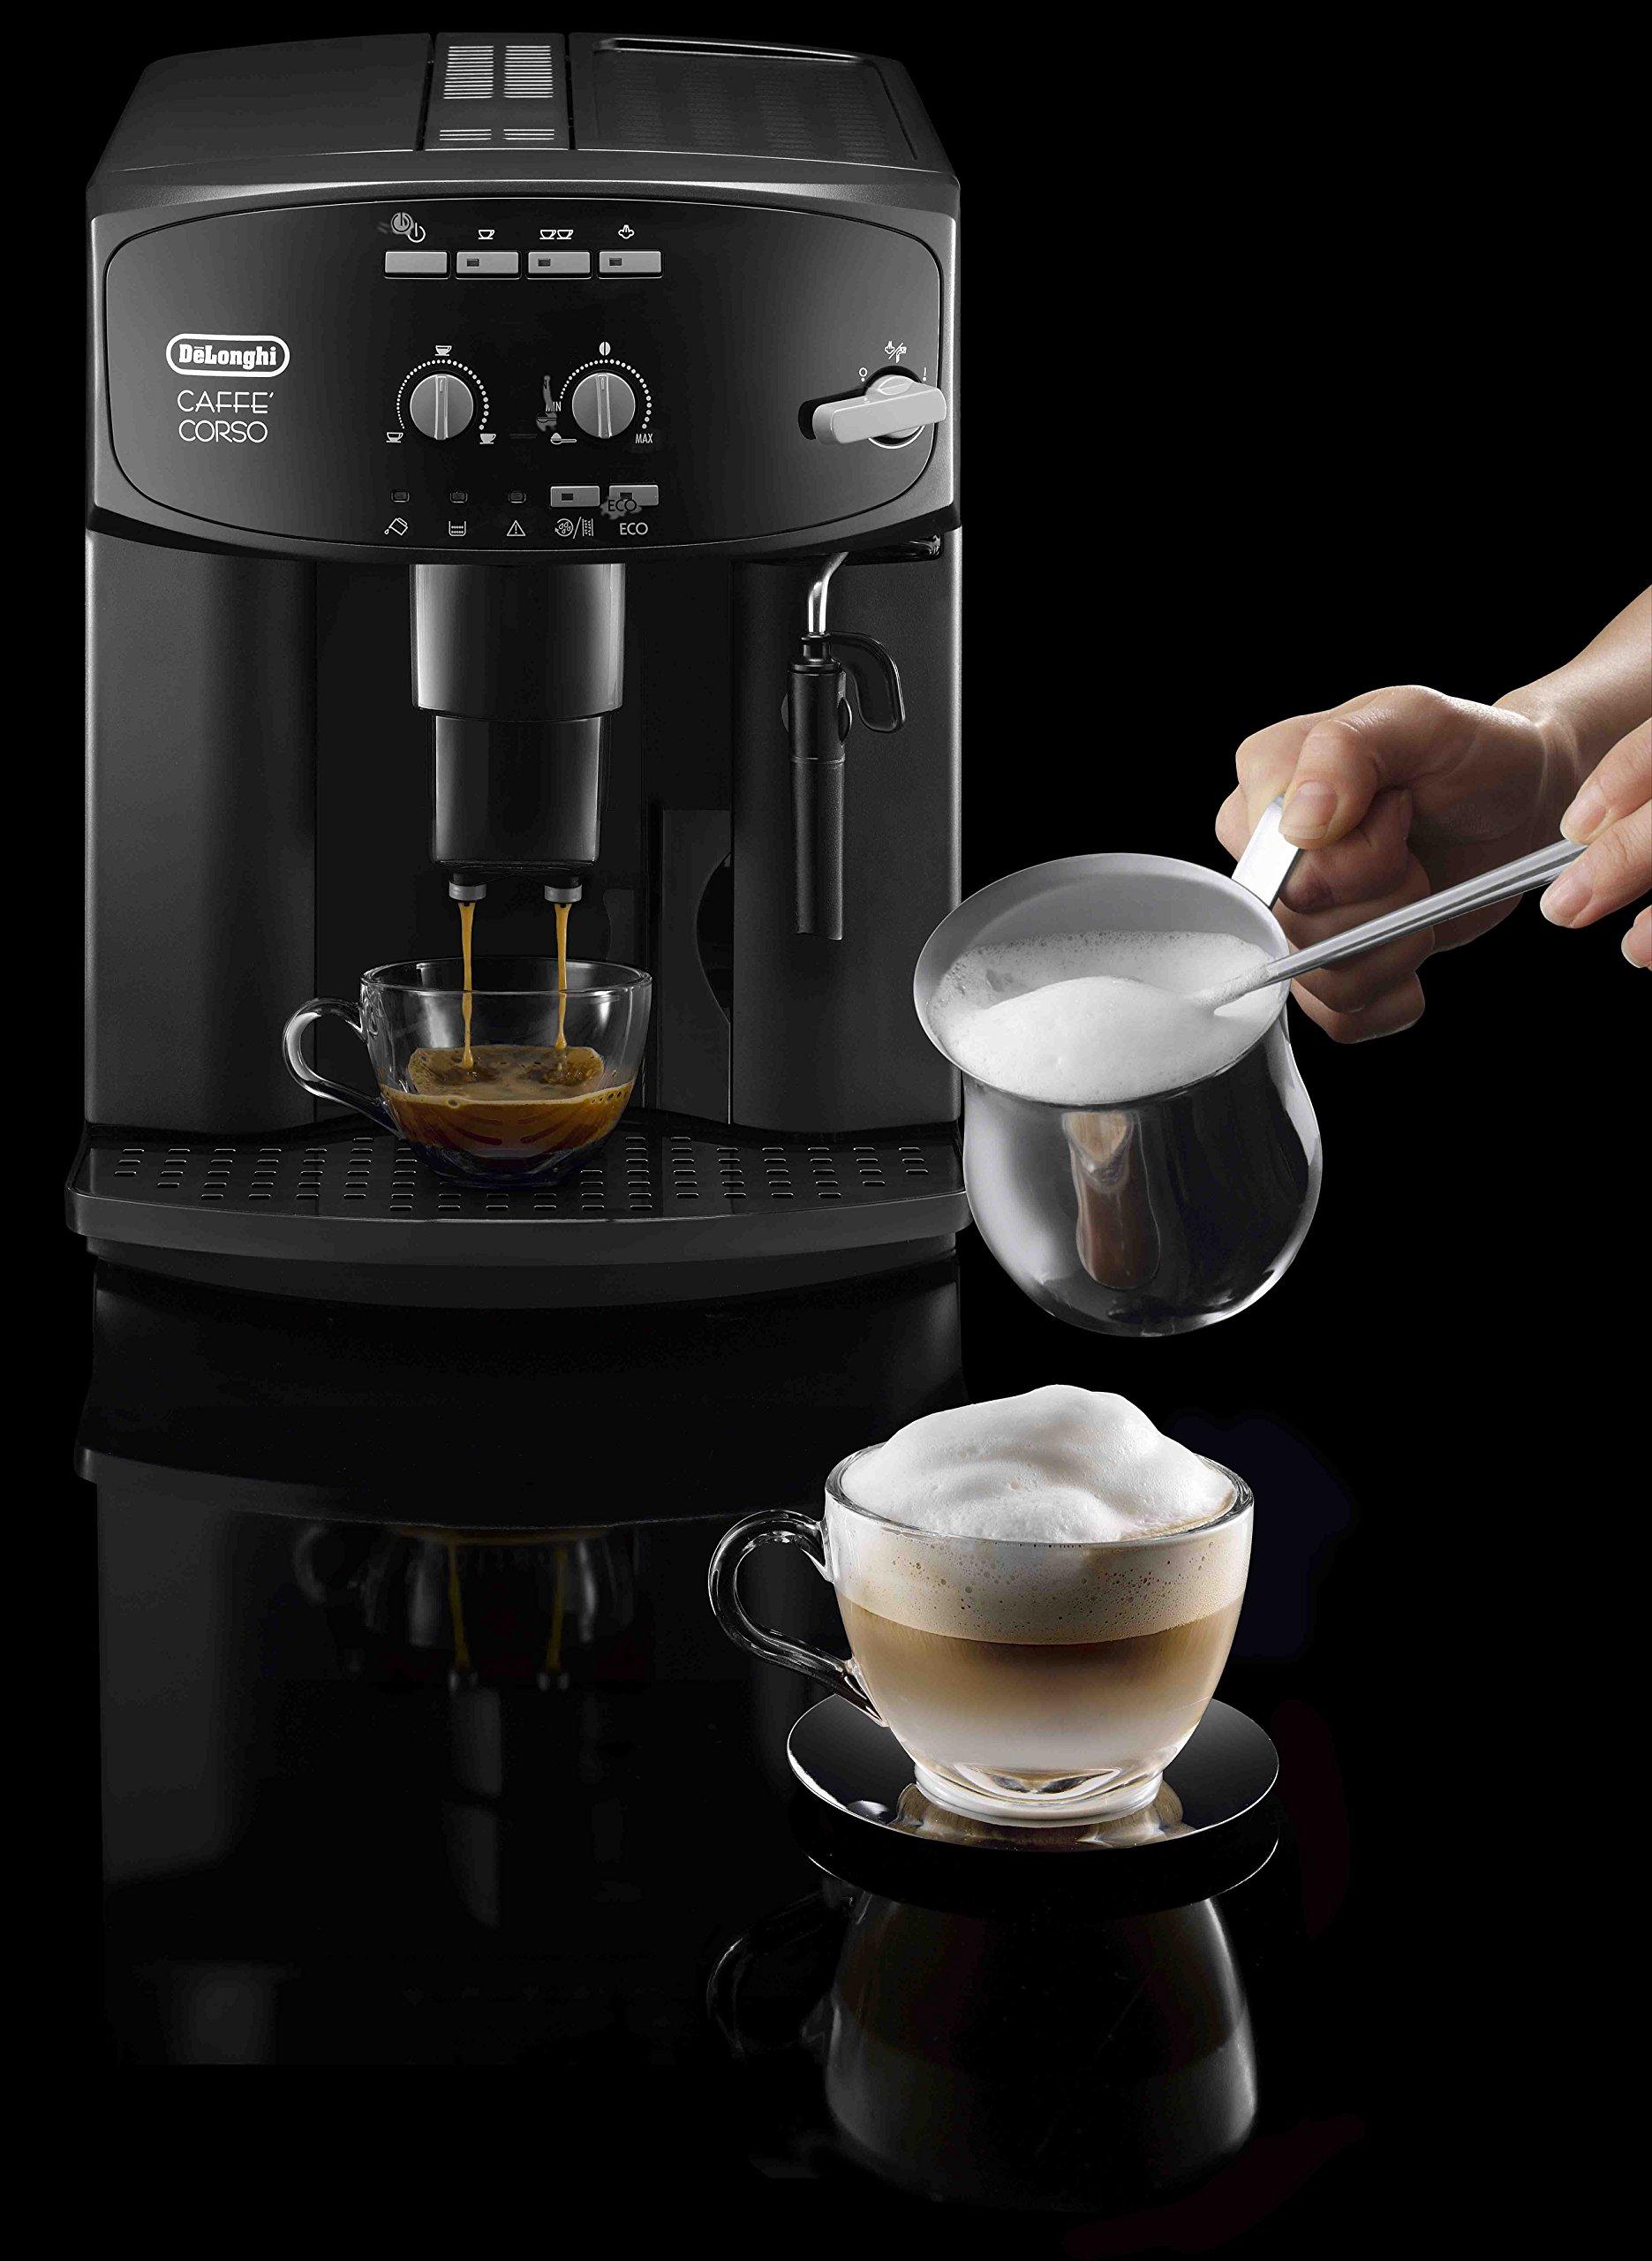 Delonghi-Delo-Vollautom-ESAM-2600bk-Caffe-Corso